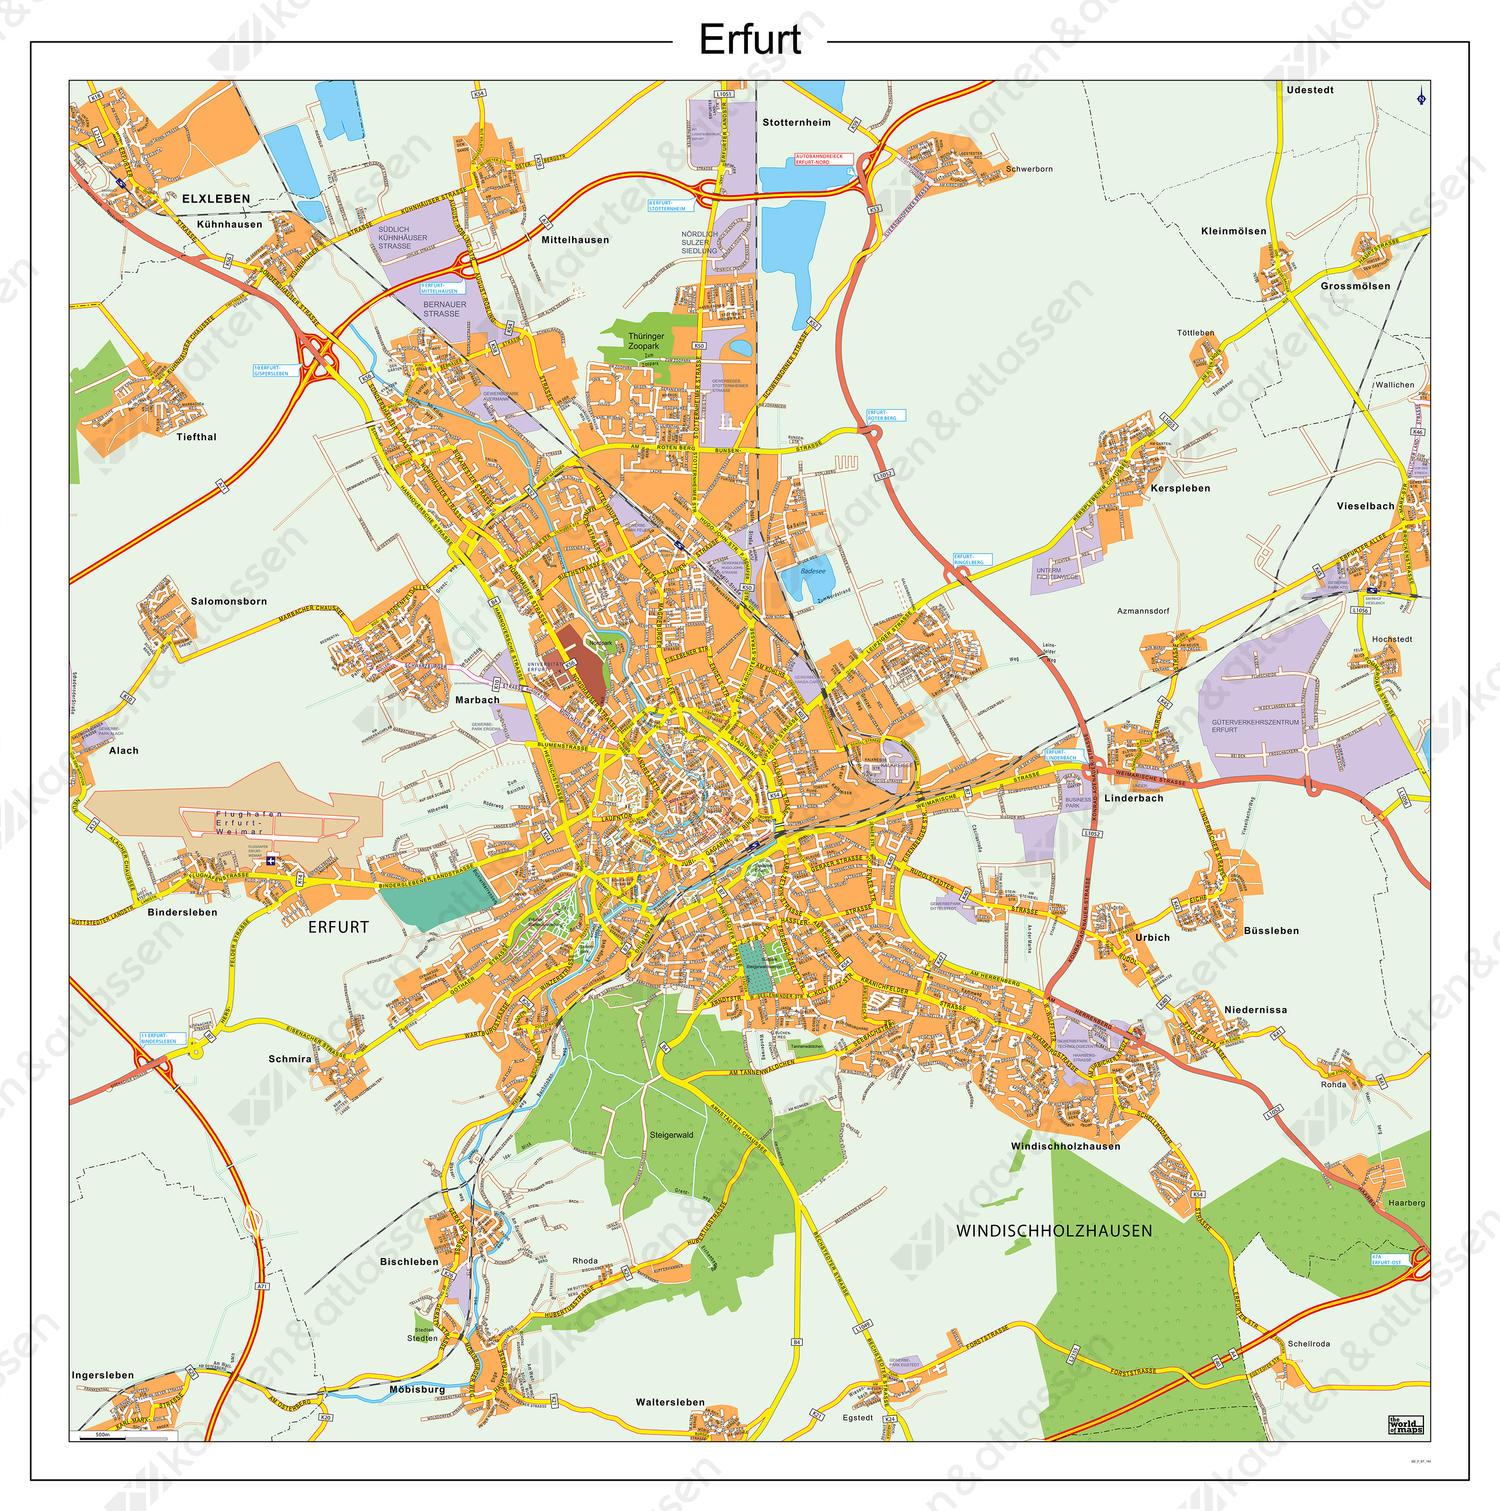 Erfurt 184